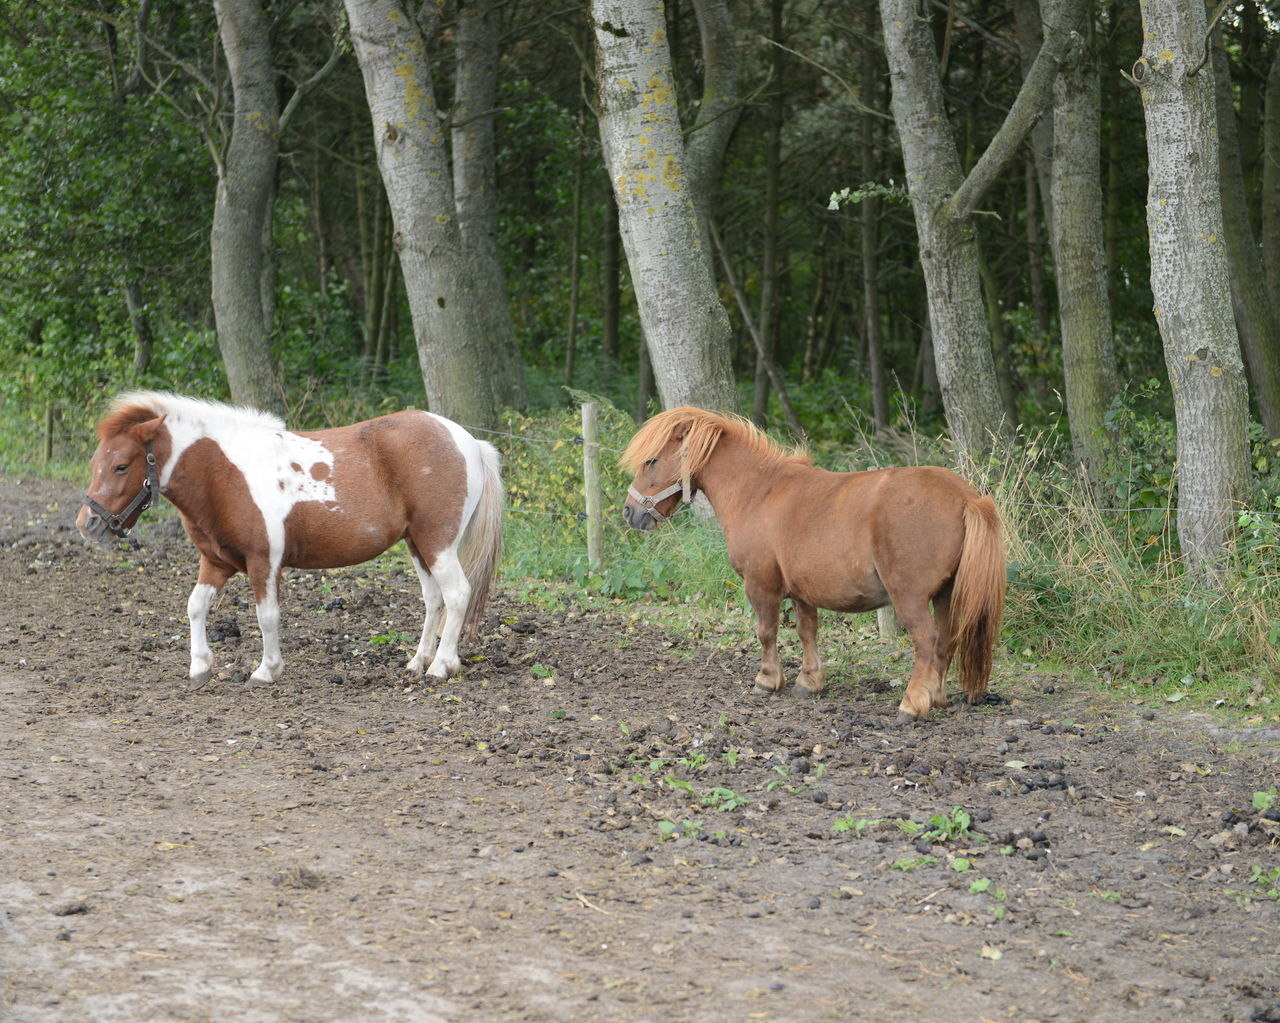 Pony My Little Pony Ponies Farm Gutter Chetlander Animals Animal Farm